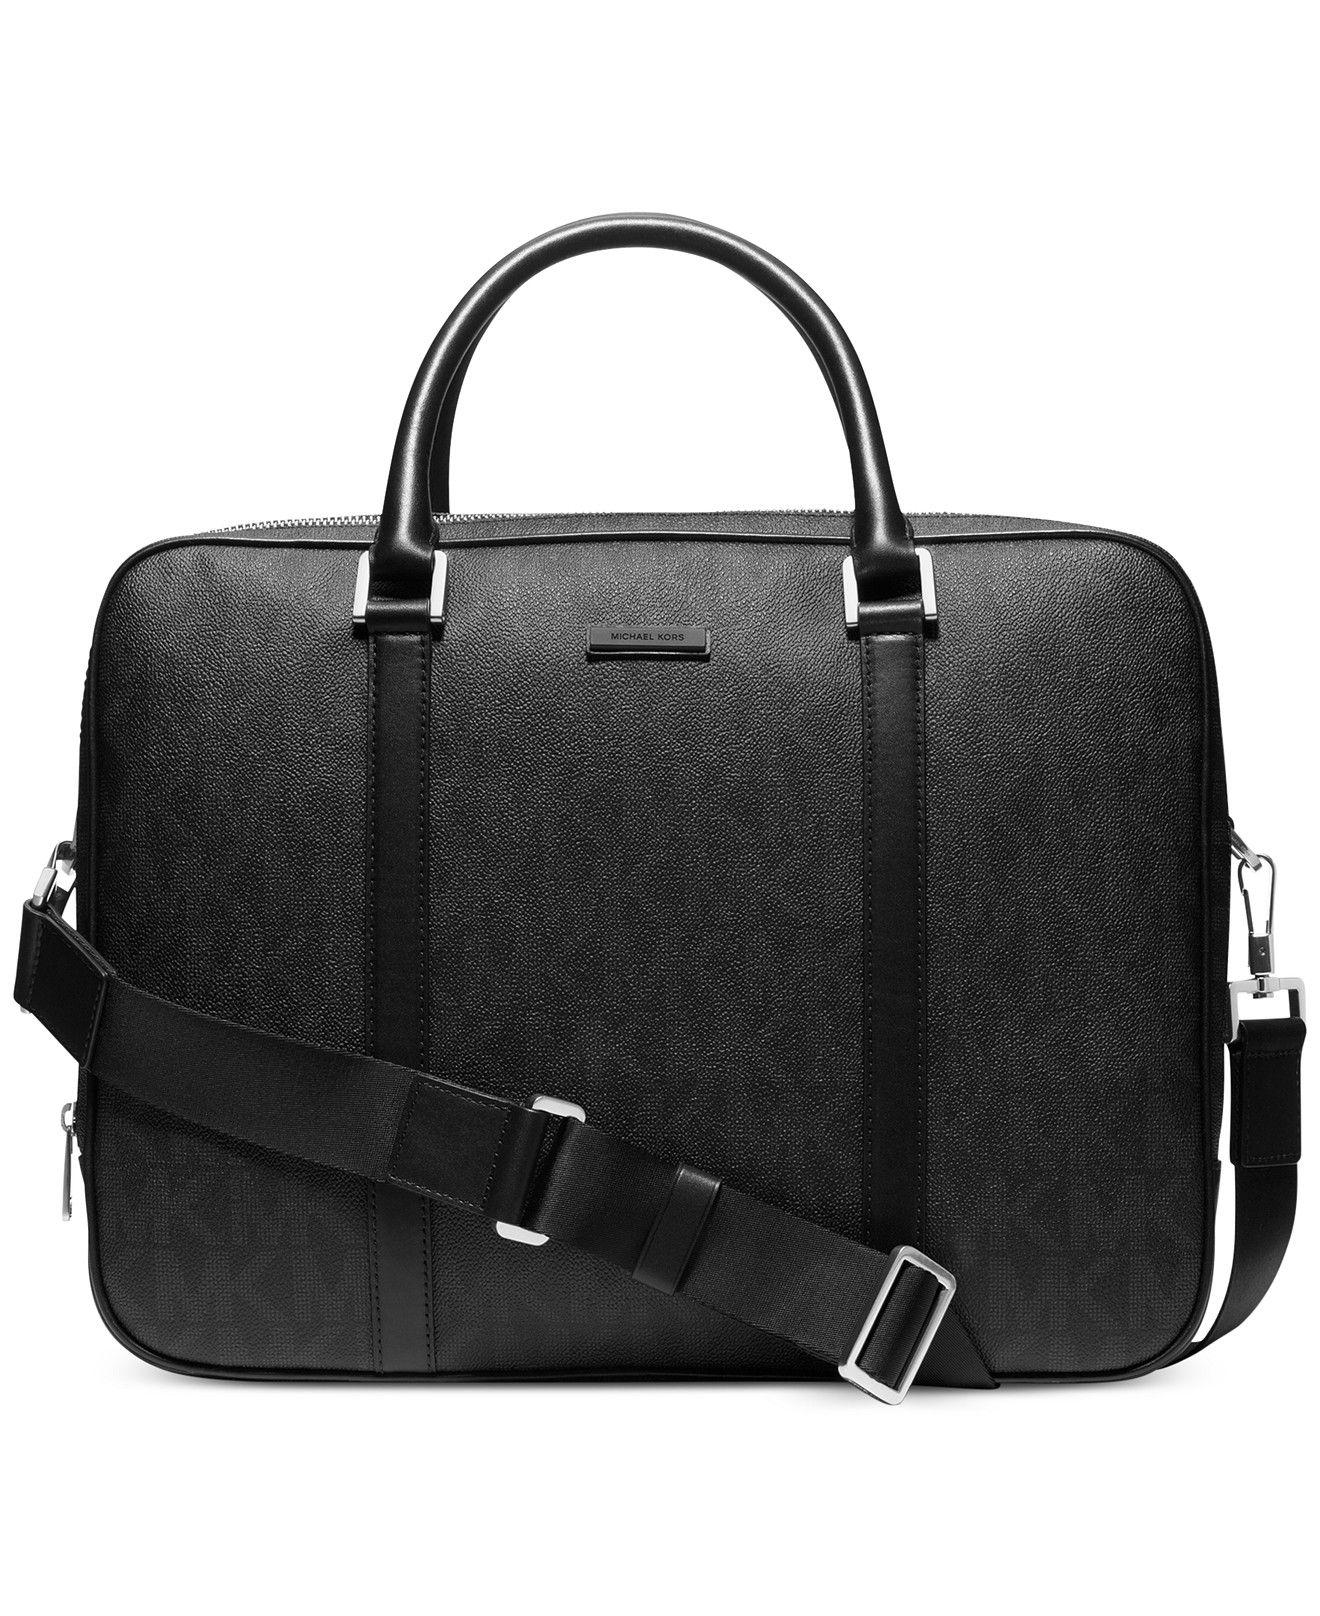 71328d1748bbff Michael Kors Jet Set Shadow Large Double-Gusset Briefcase - Bags & Backpacks  - Men - Macy's